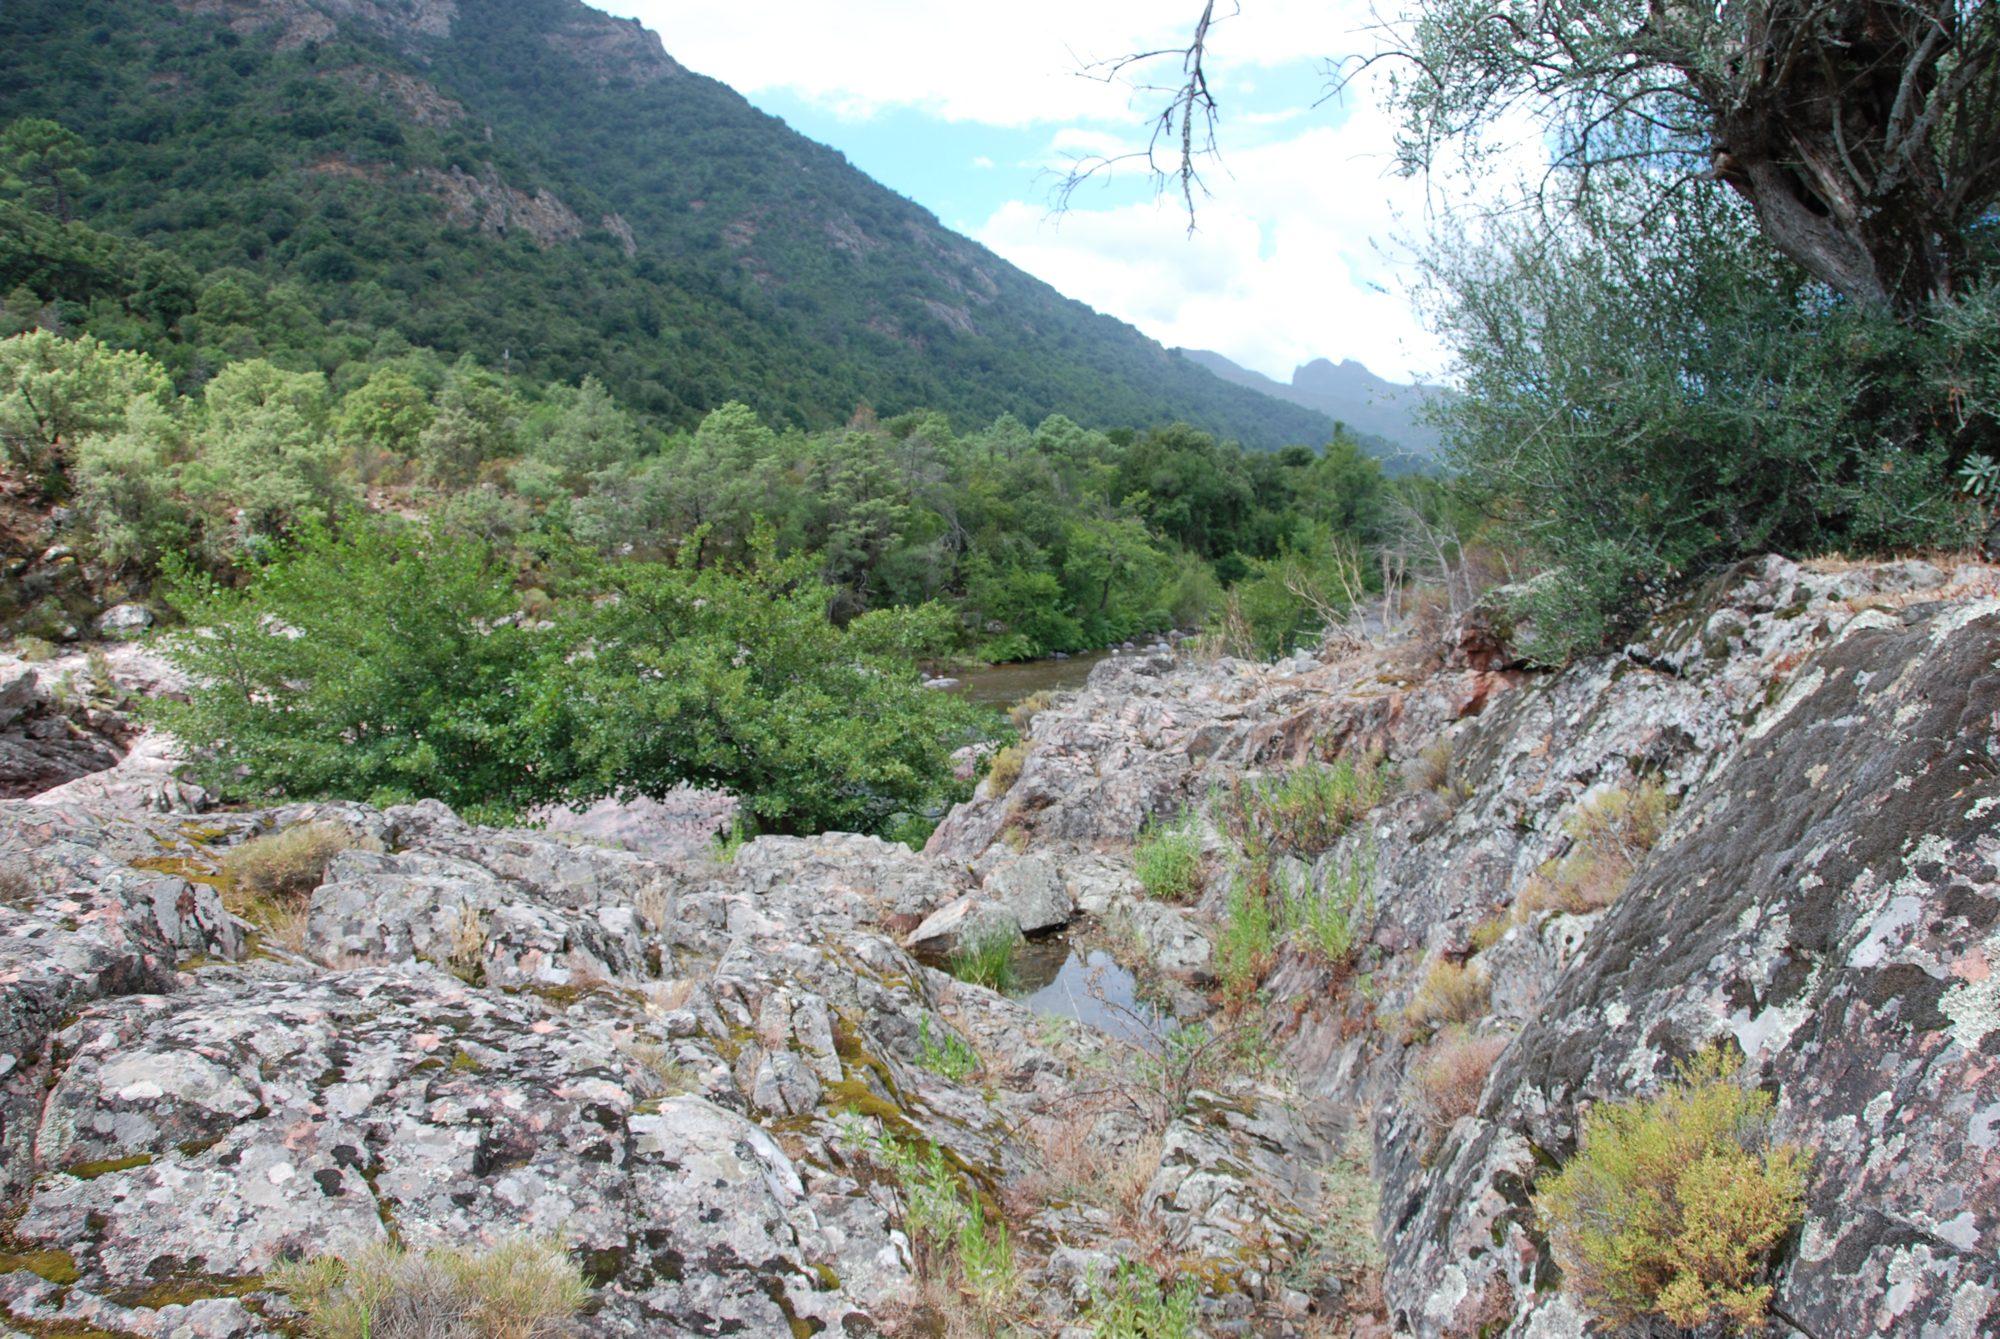 Wanderung im Fangotal auf Korsika